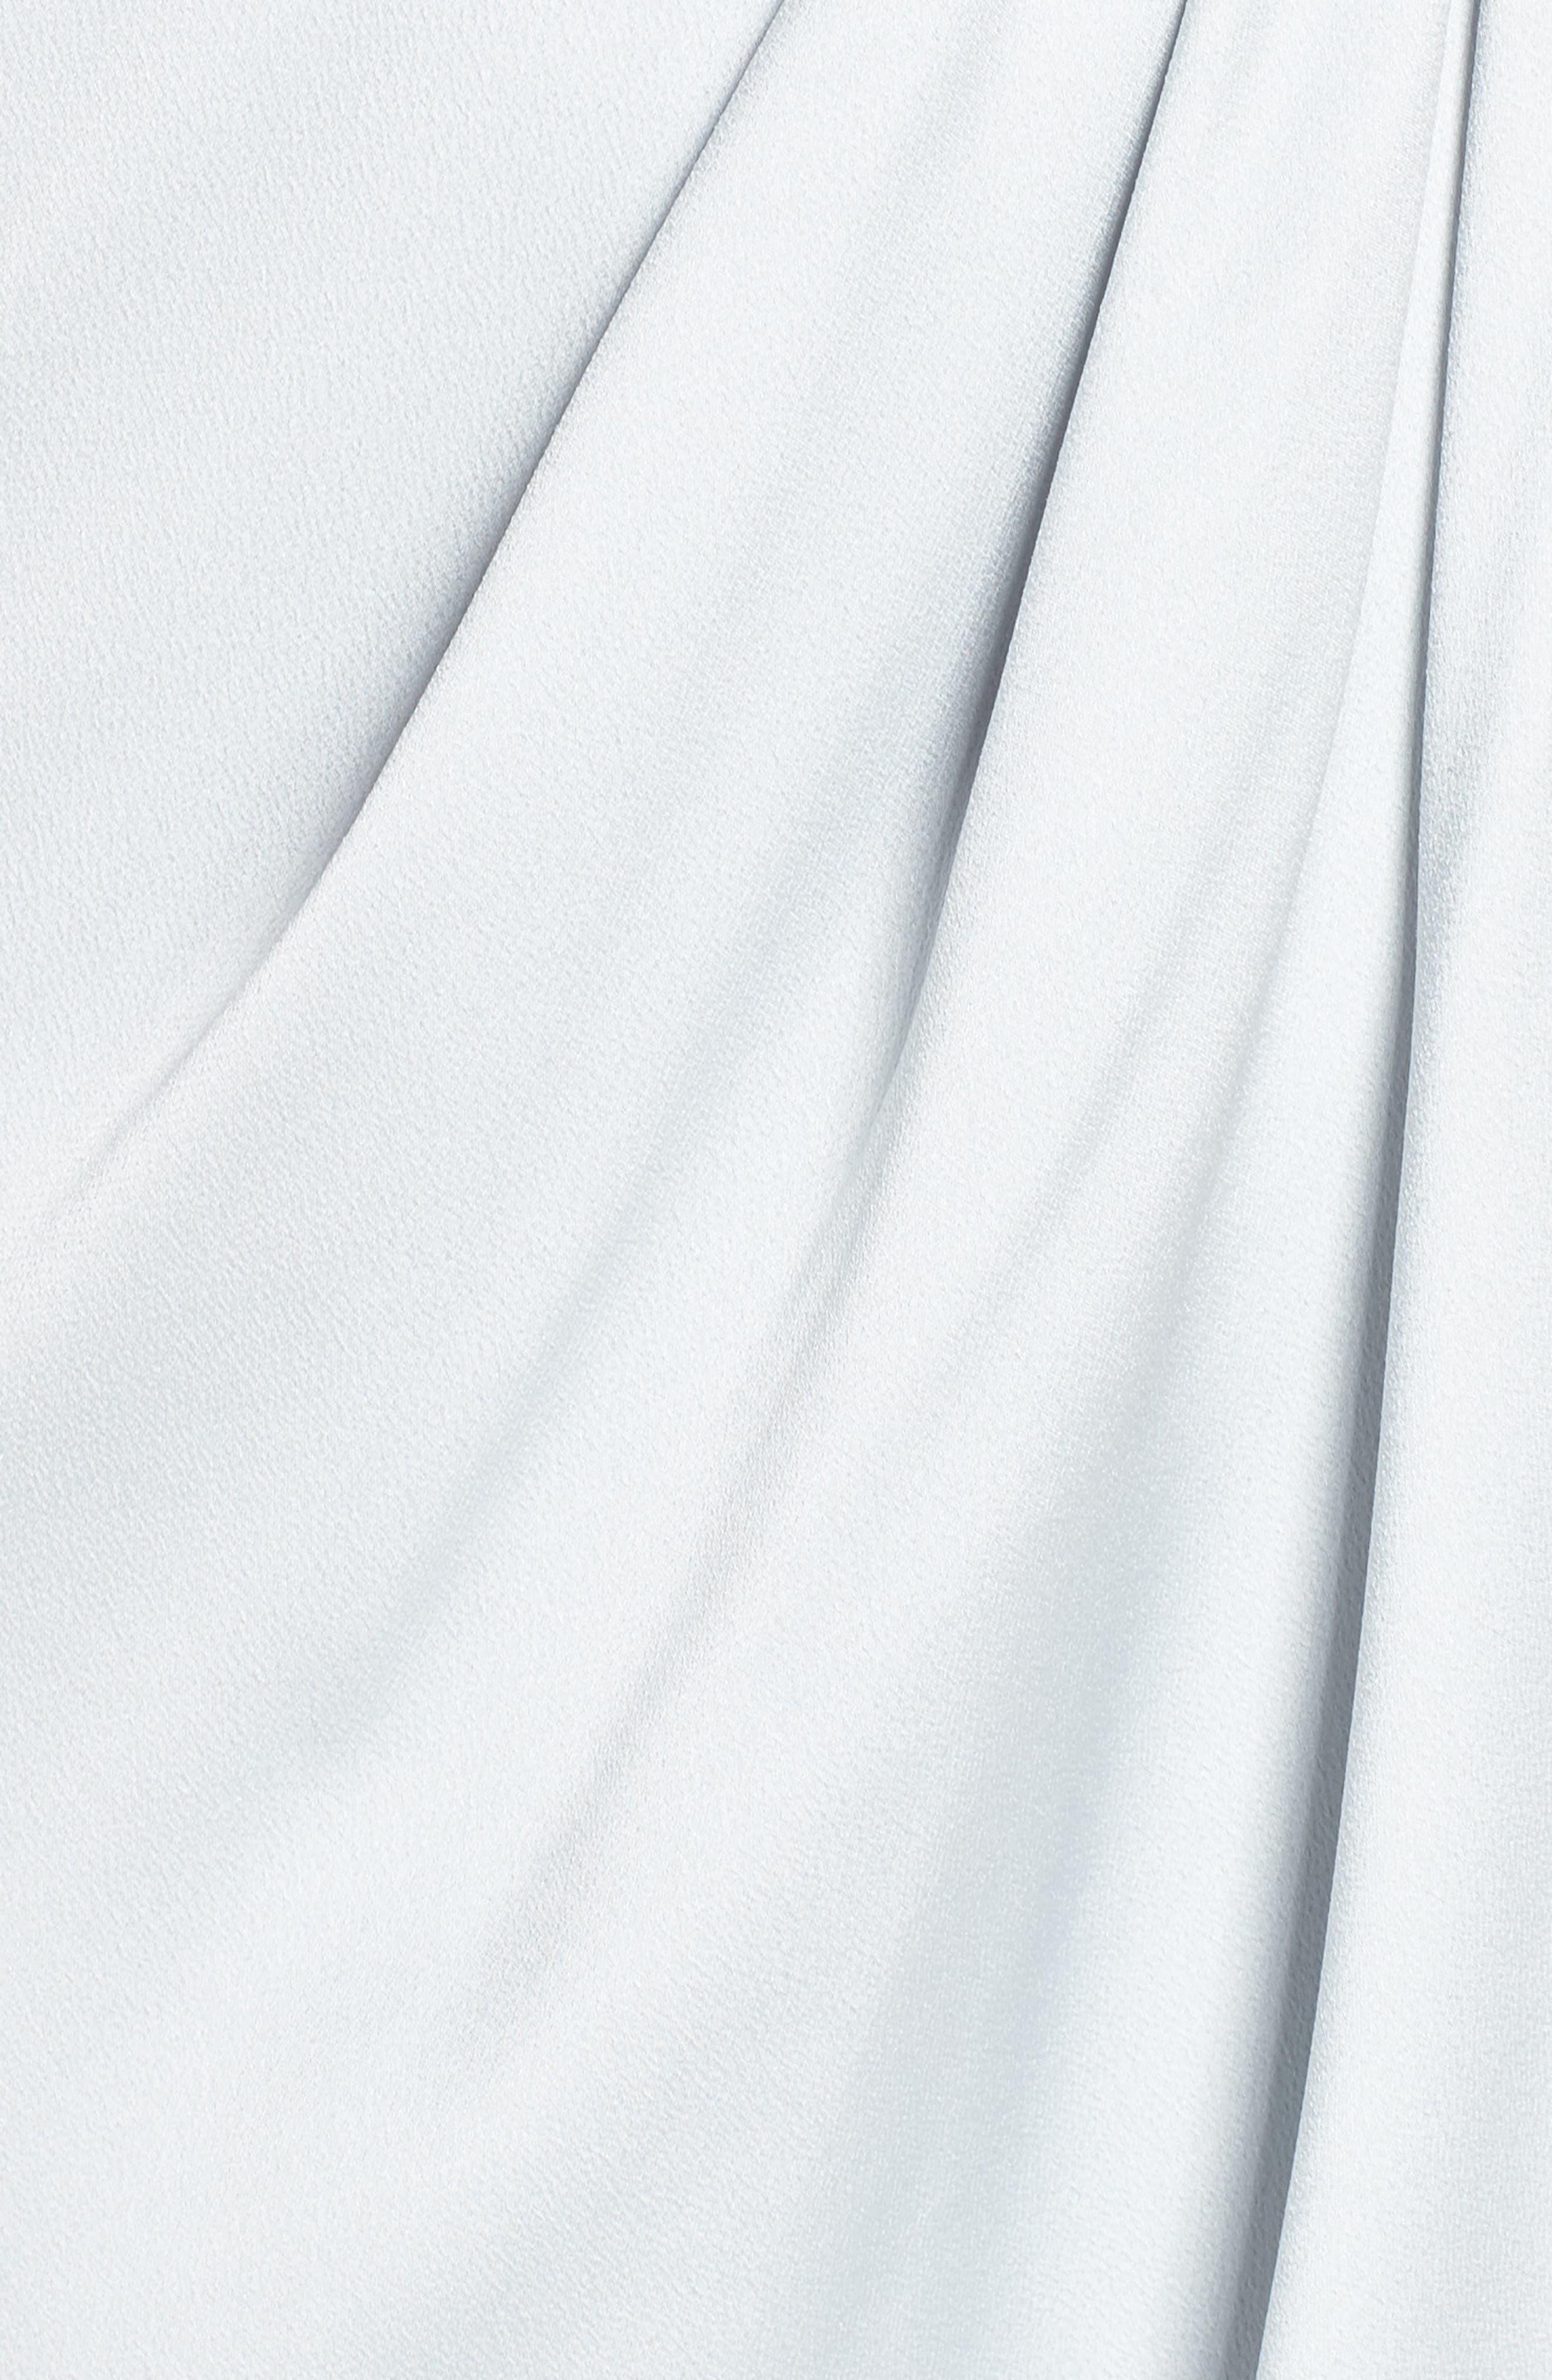 Luxe Frill Tulip Hem Maxi Dress,                             Alternate thumbnail 6, color,                             450